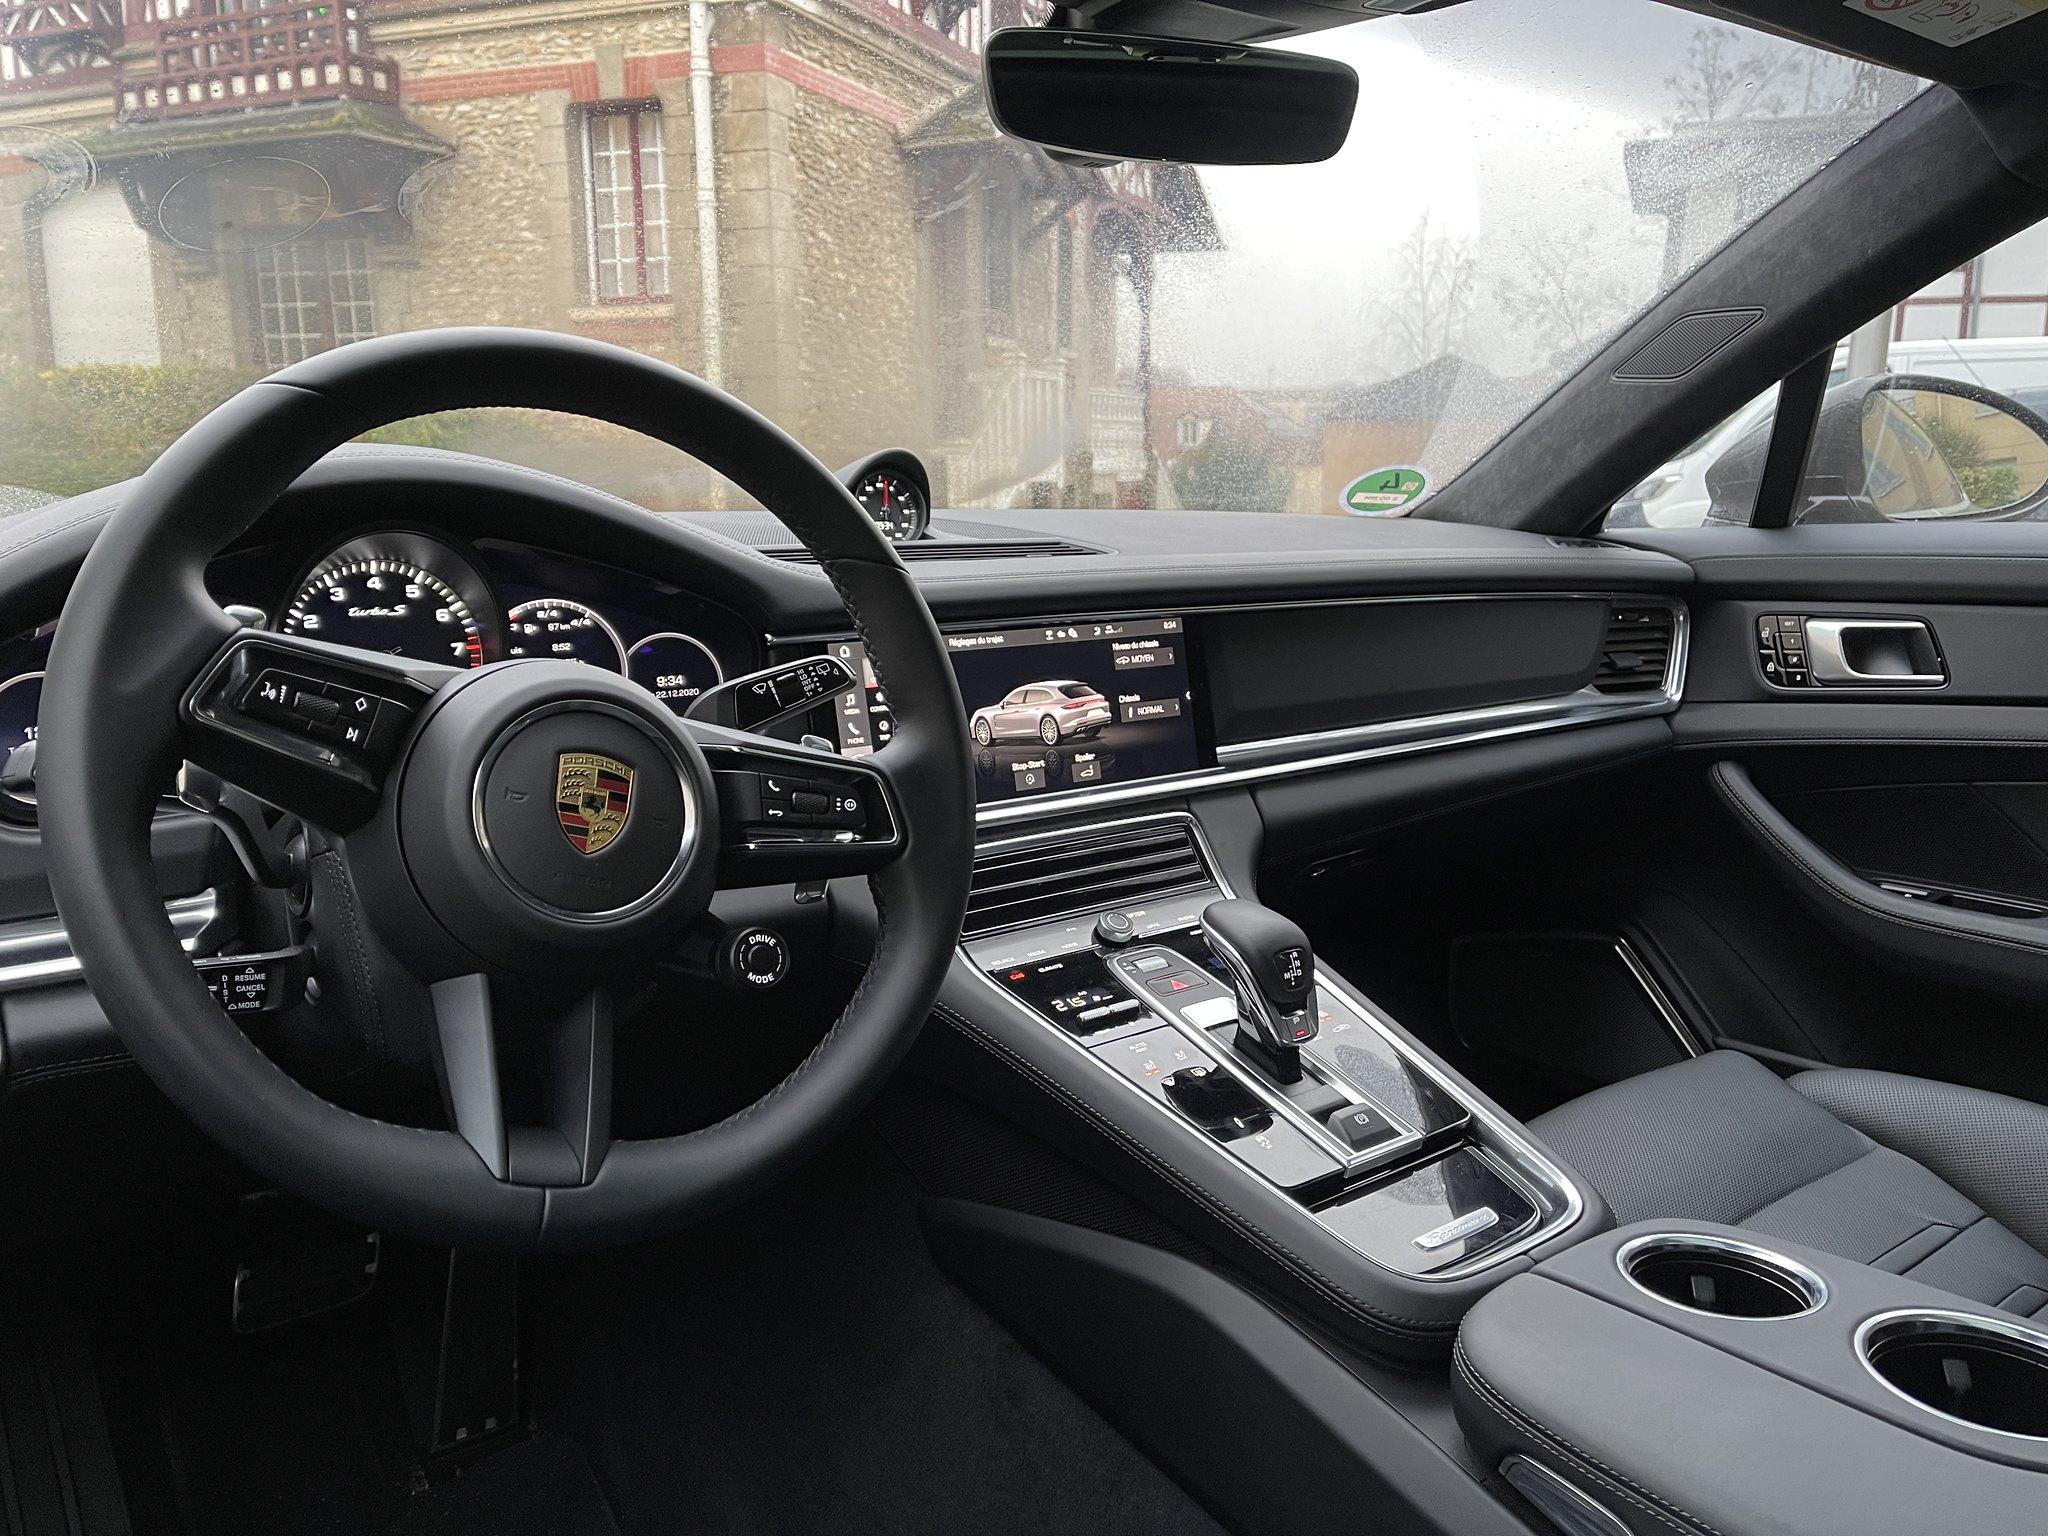 Essai Porsche Panamera Turbo S Sport Turismo (33)